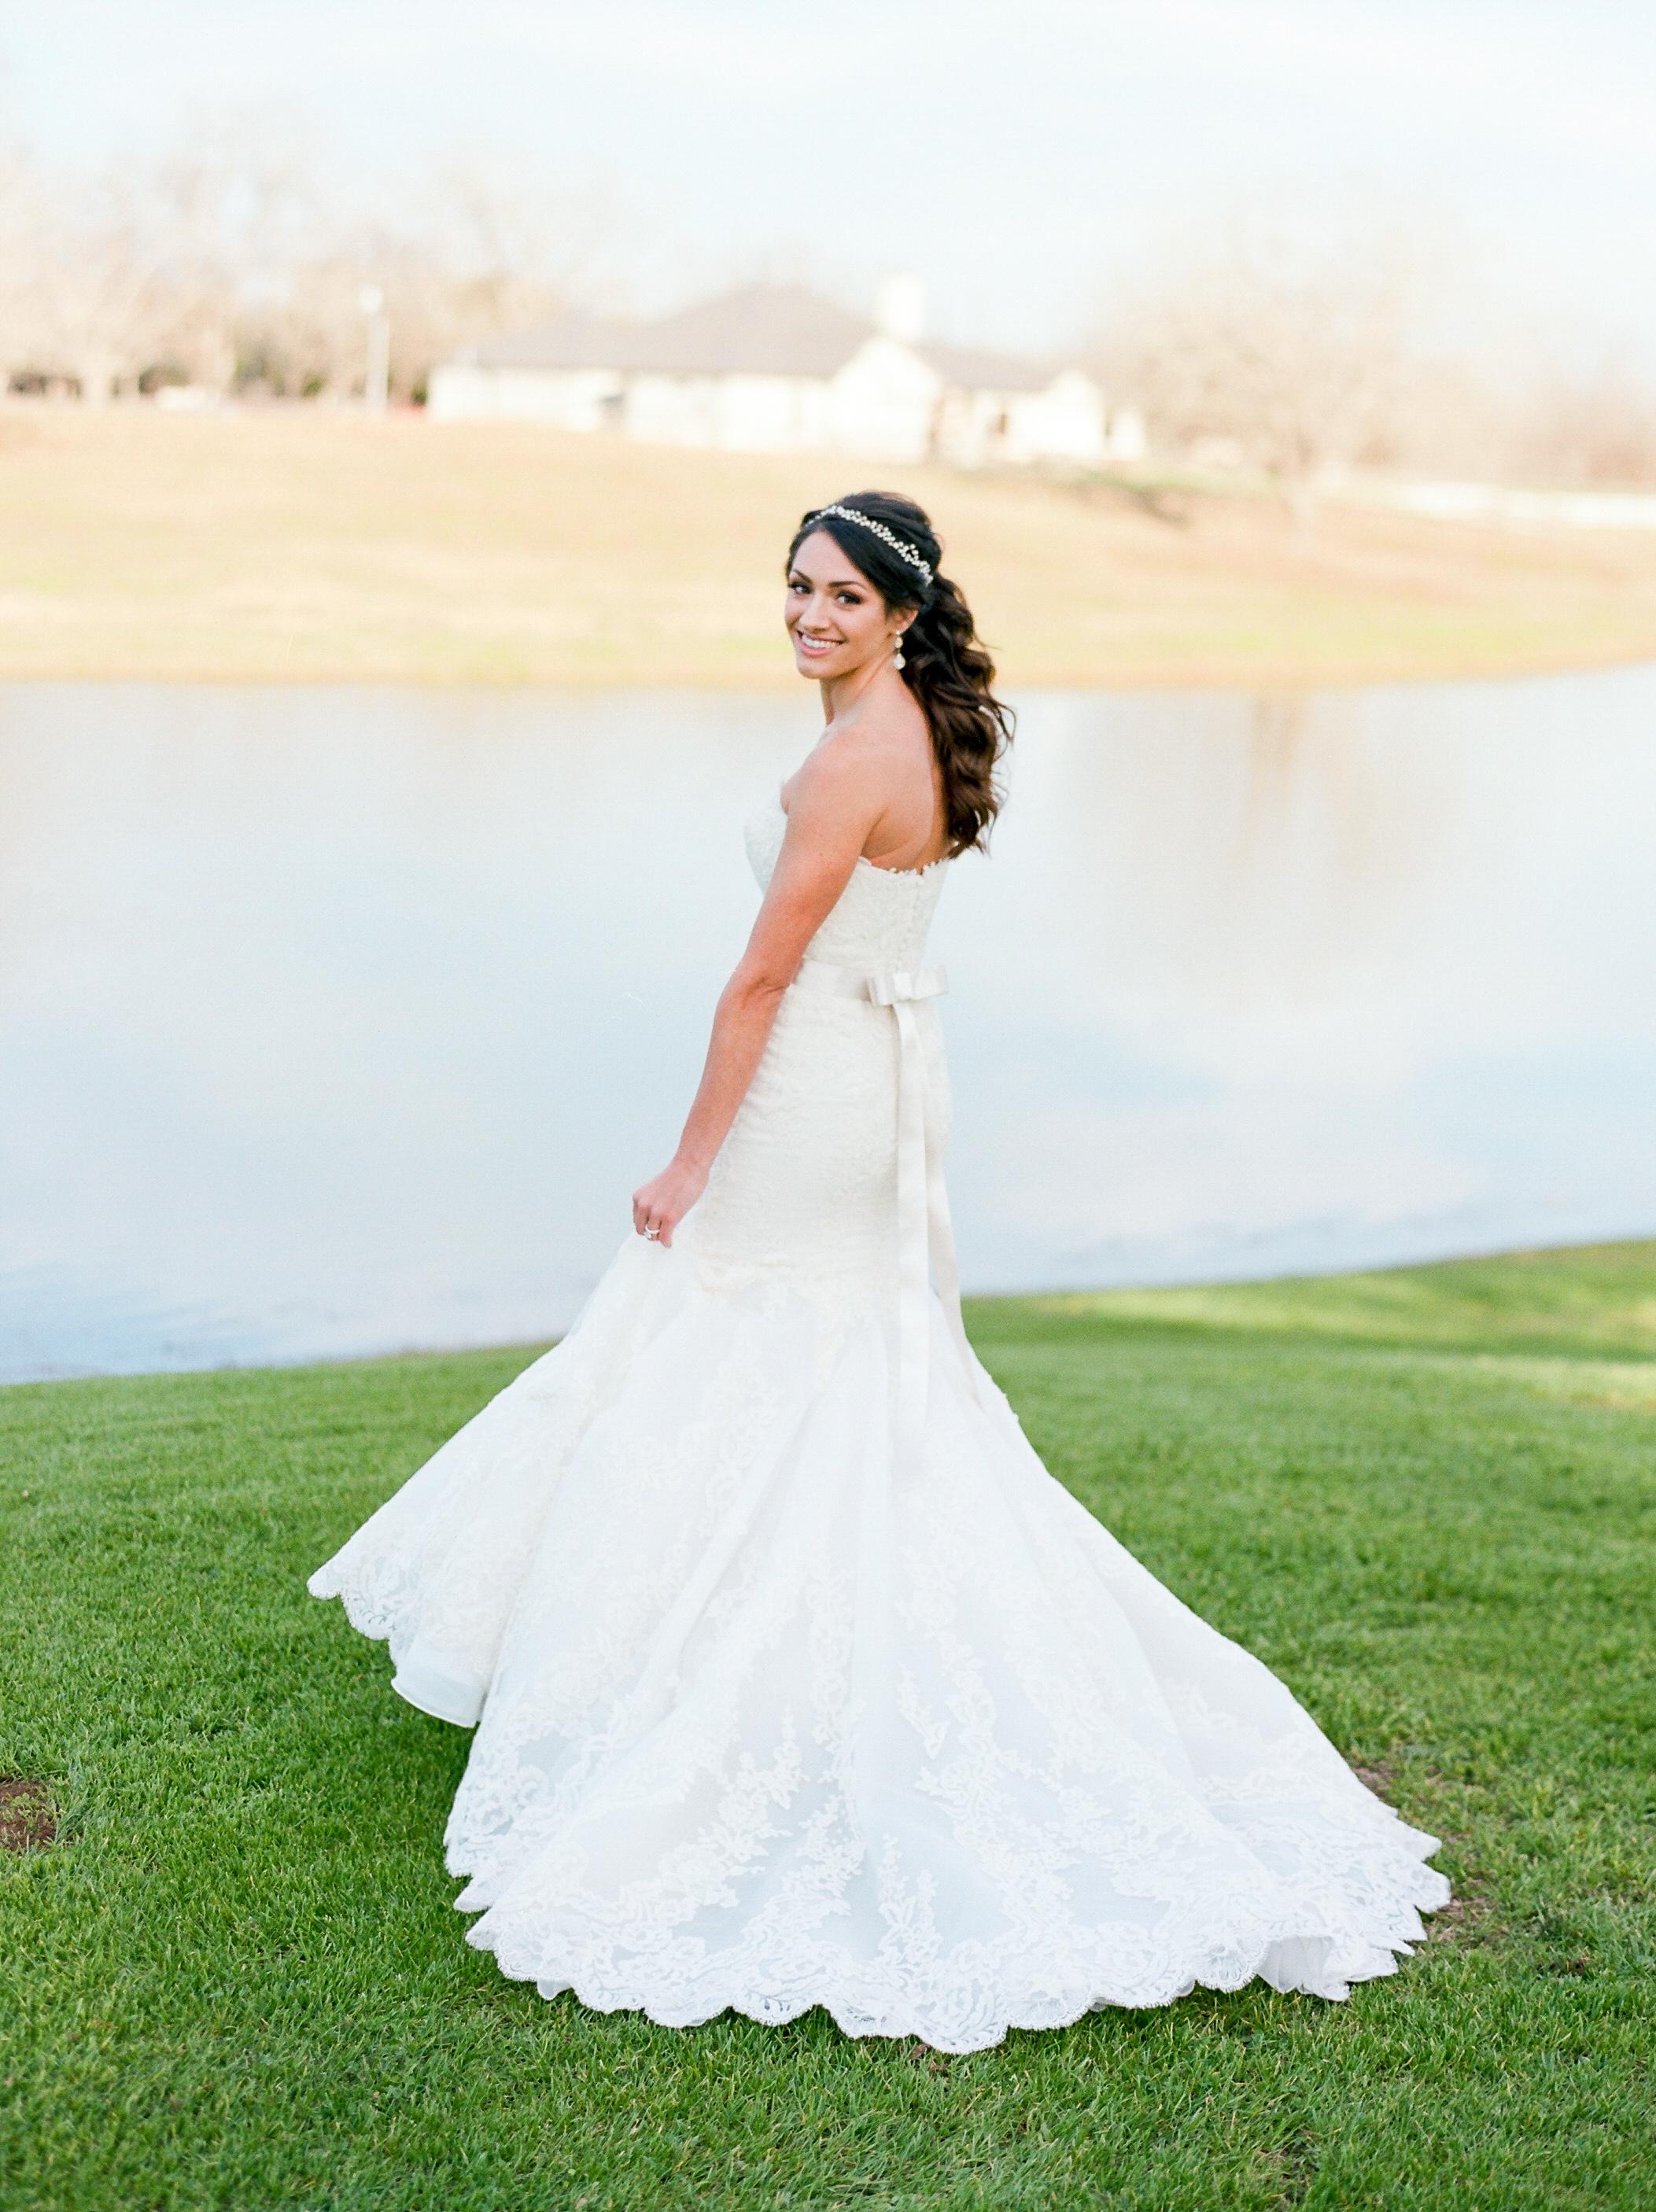 Briscoe-Manor-Houston-Wedding-Photographer-Modern-Luxury-Weddings-Dana-Fernandez-Photograpy-Fine-Art-Photographer-Houston-Film-Destination-PNW-Wedding-Photographer-26.jpg